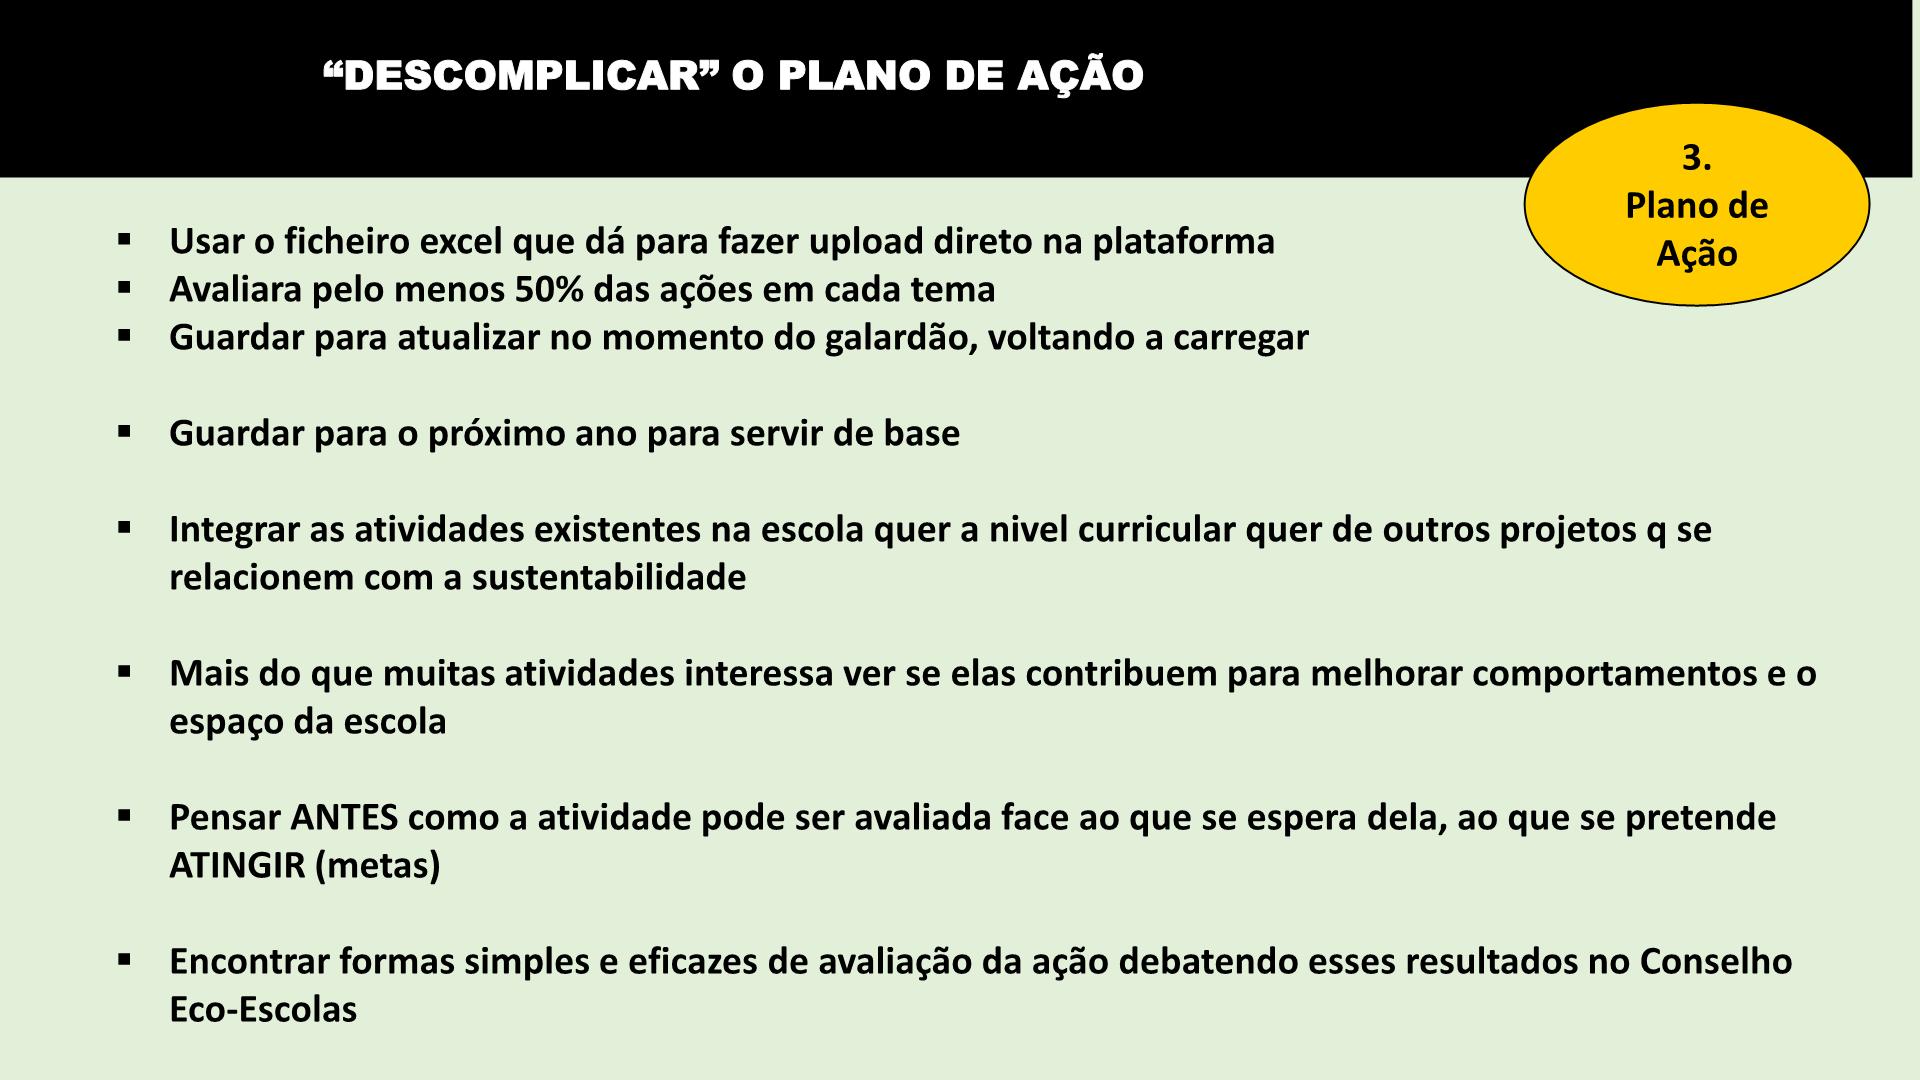 DESCOMPLICAR14